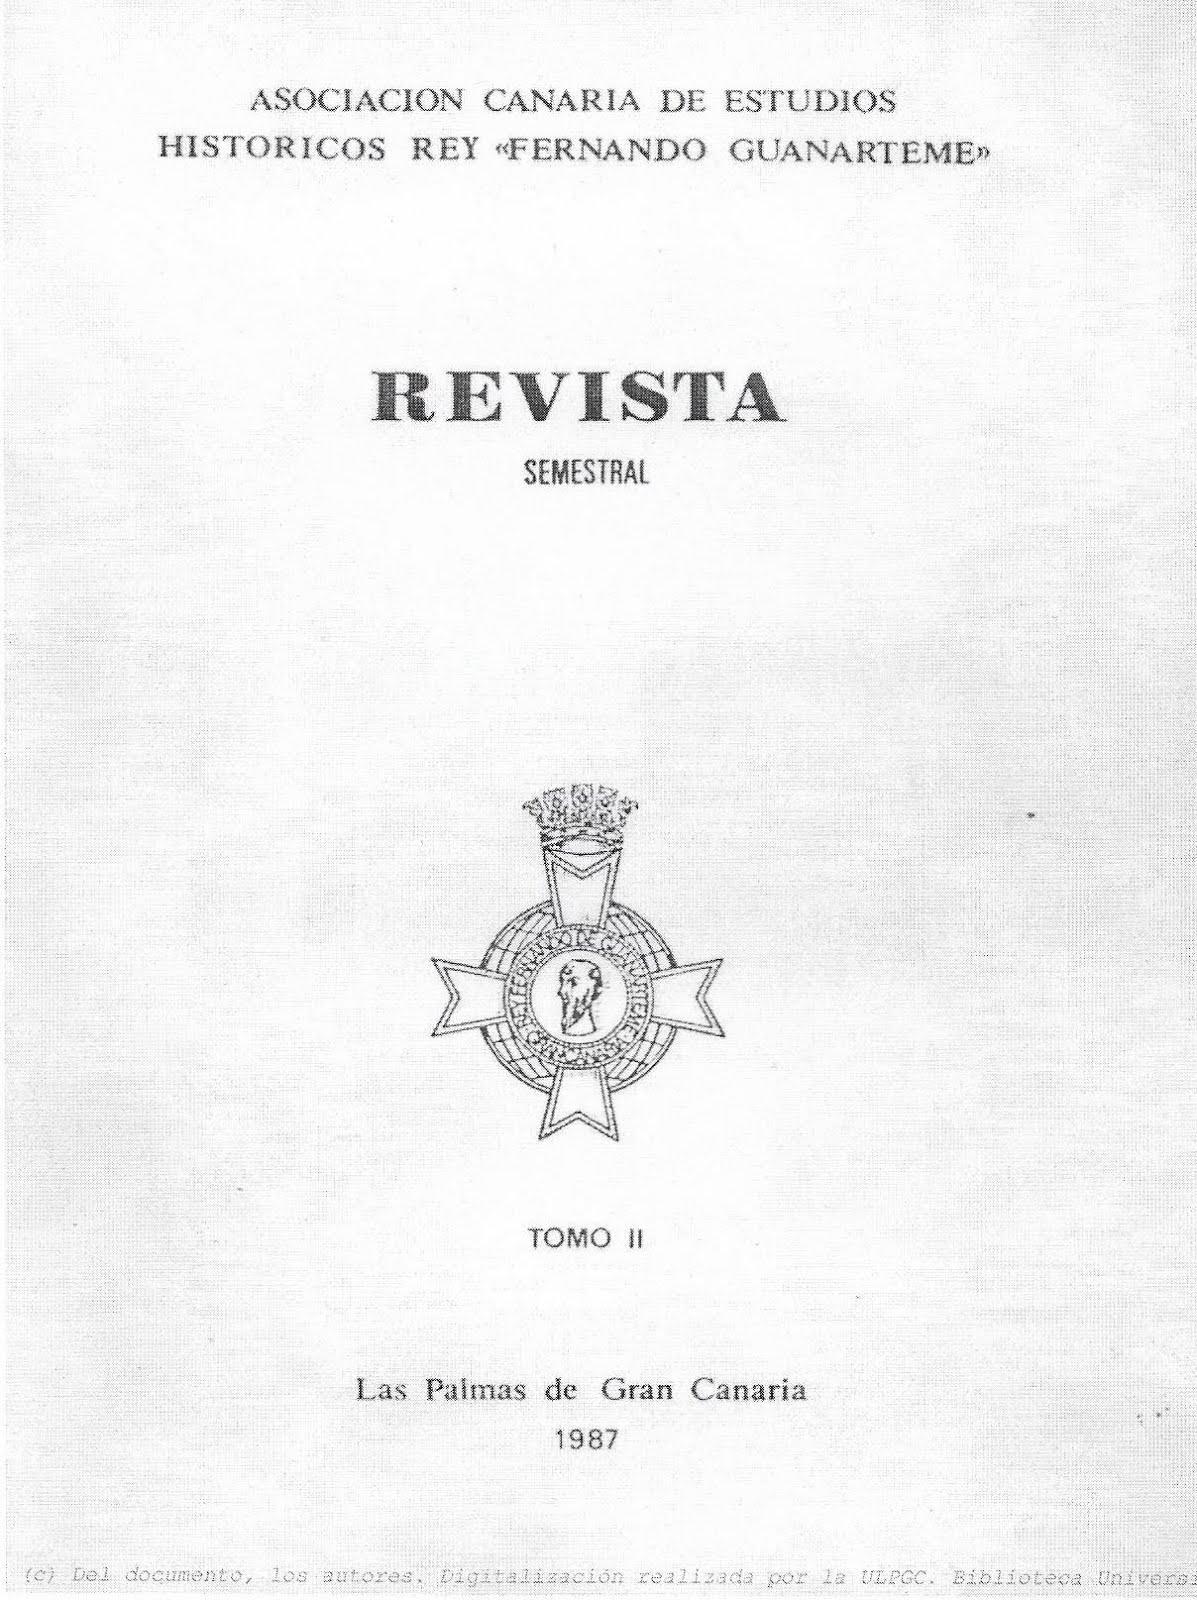 REVISTA TOMO II